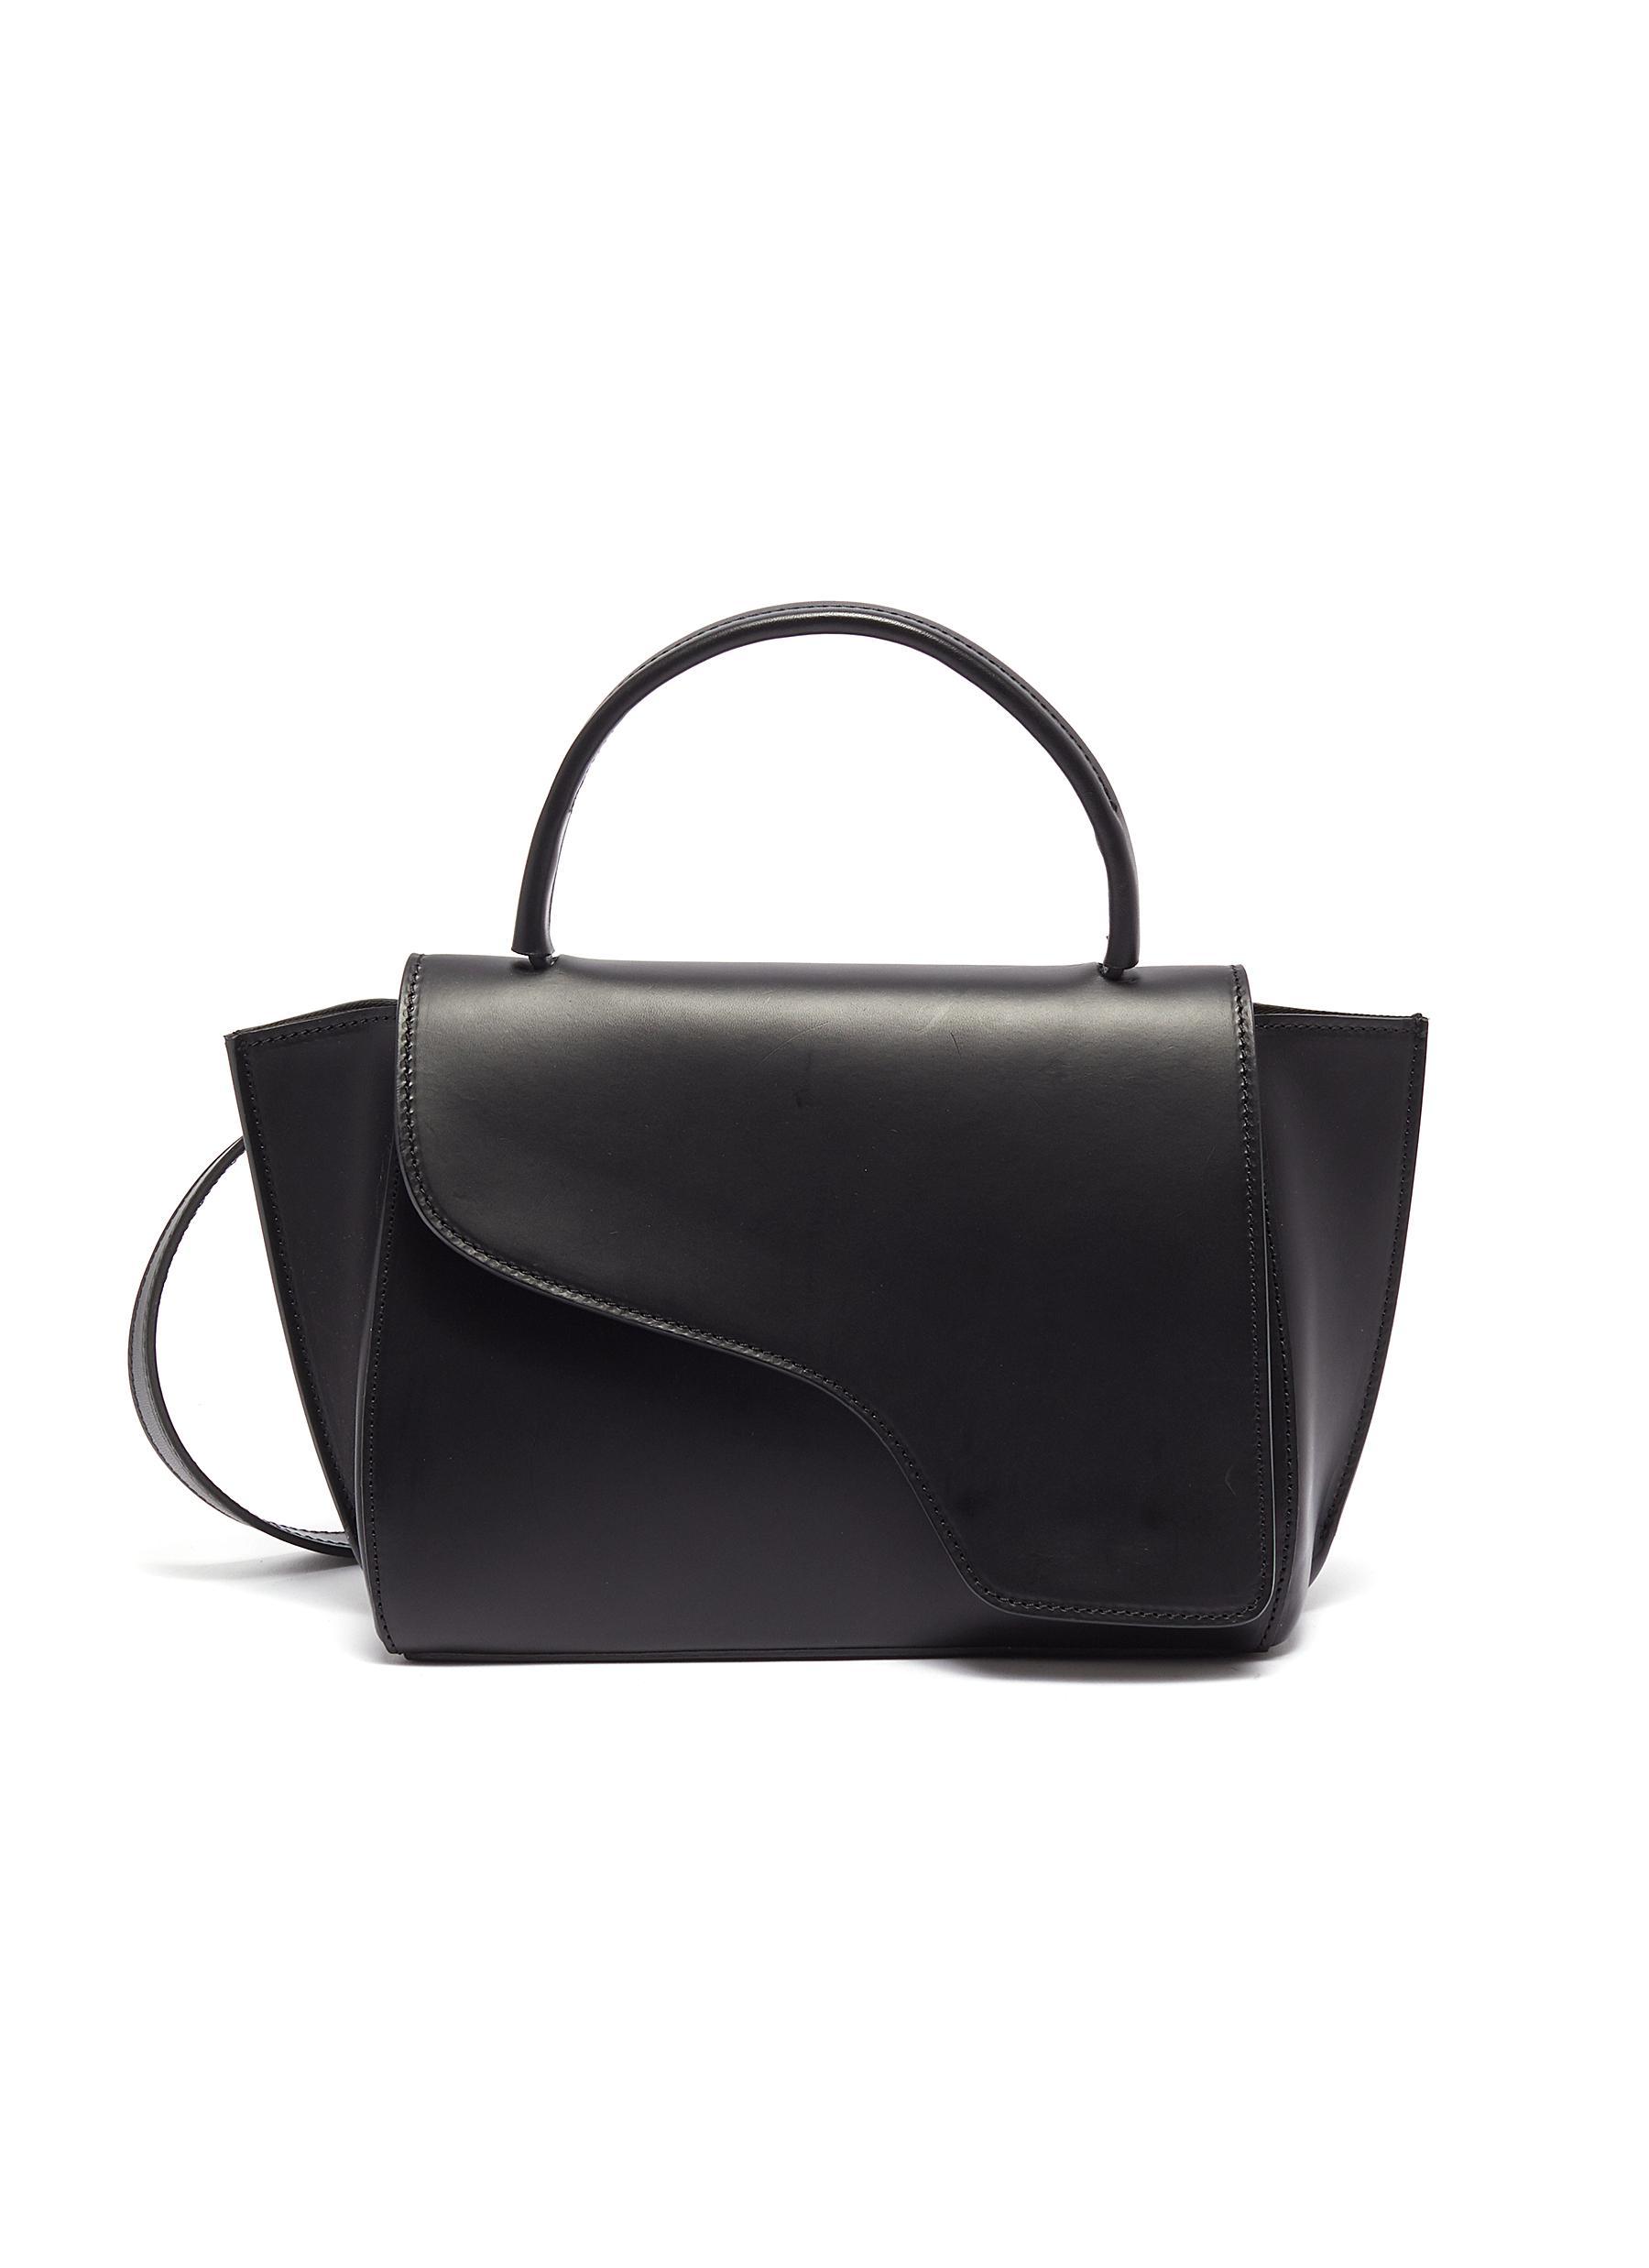 Atp Atelier Shoulder 'Arezzo' medium leather shoulder bag